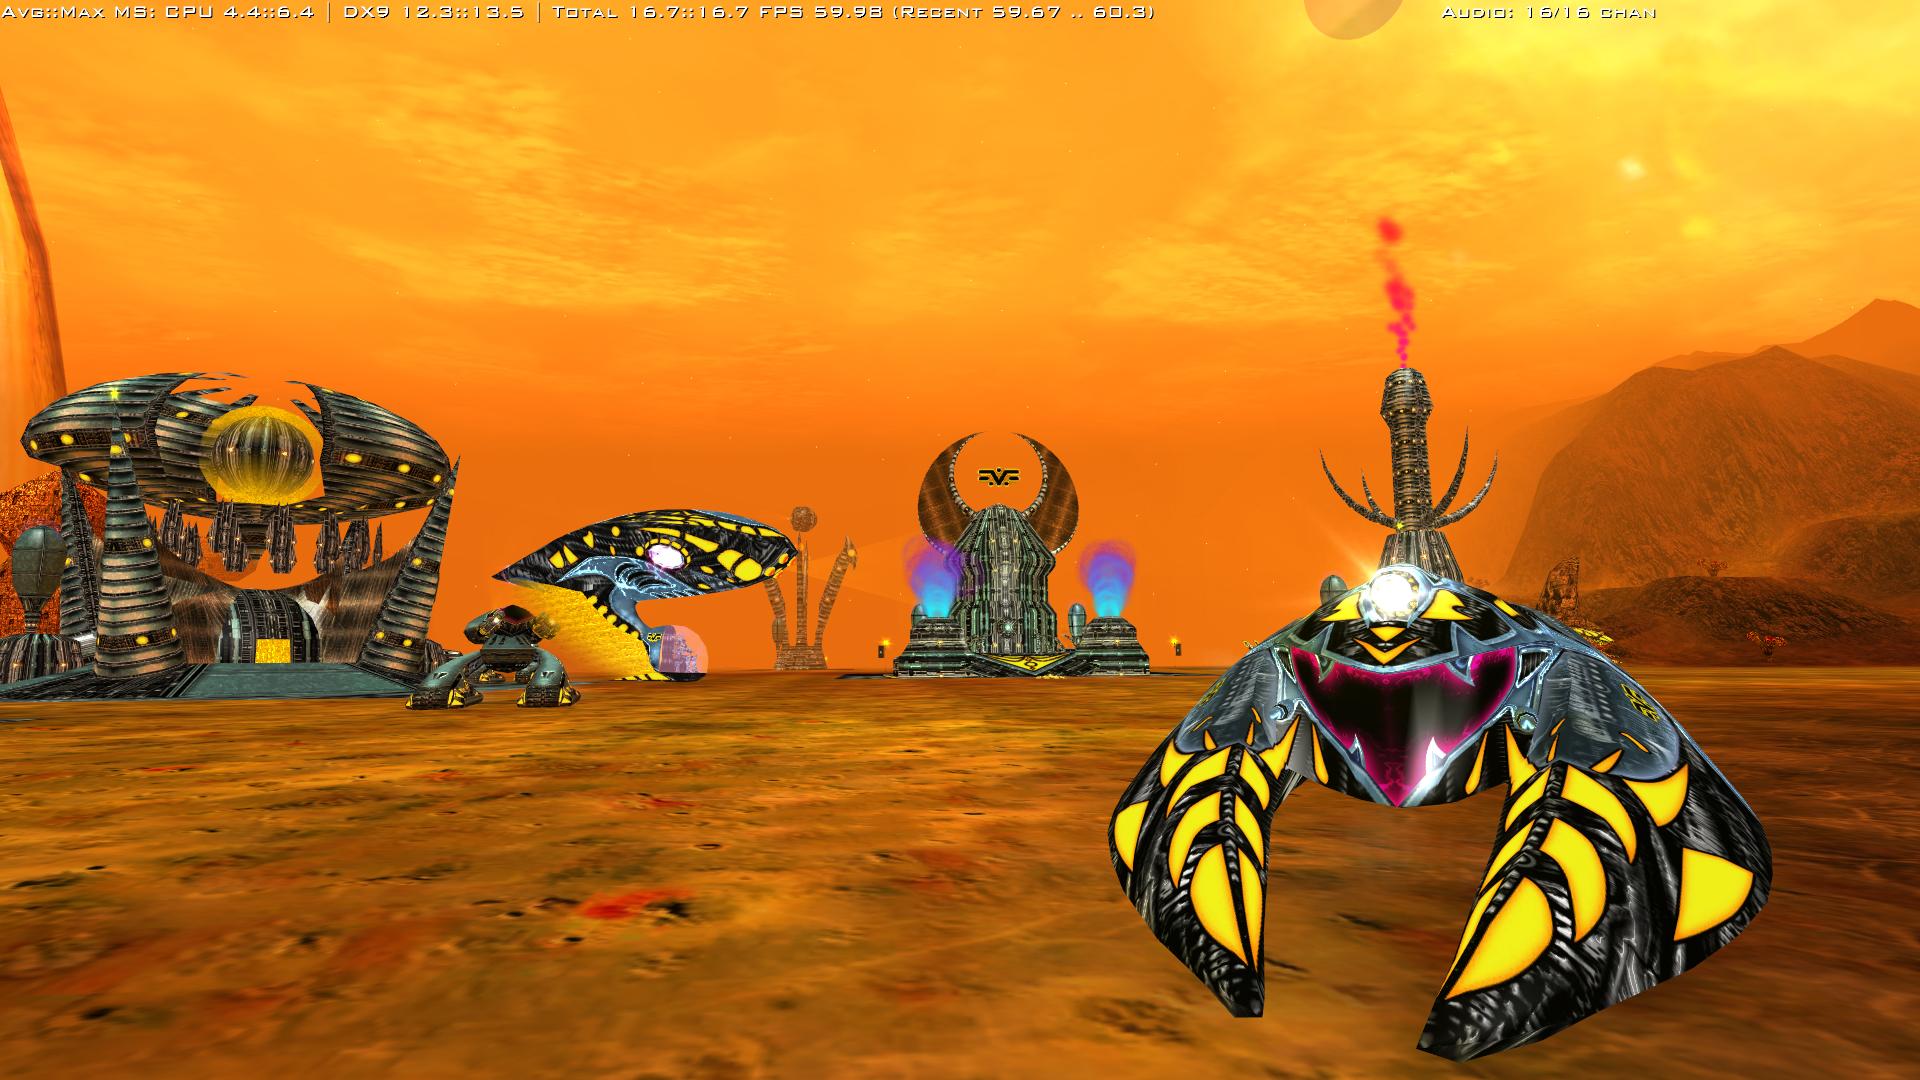 Scirendbase 7 image battlezone ii remodeled for for Battlezone 2